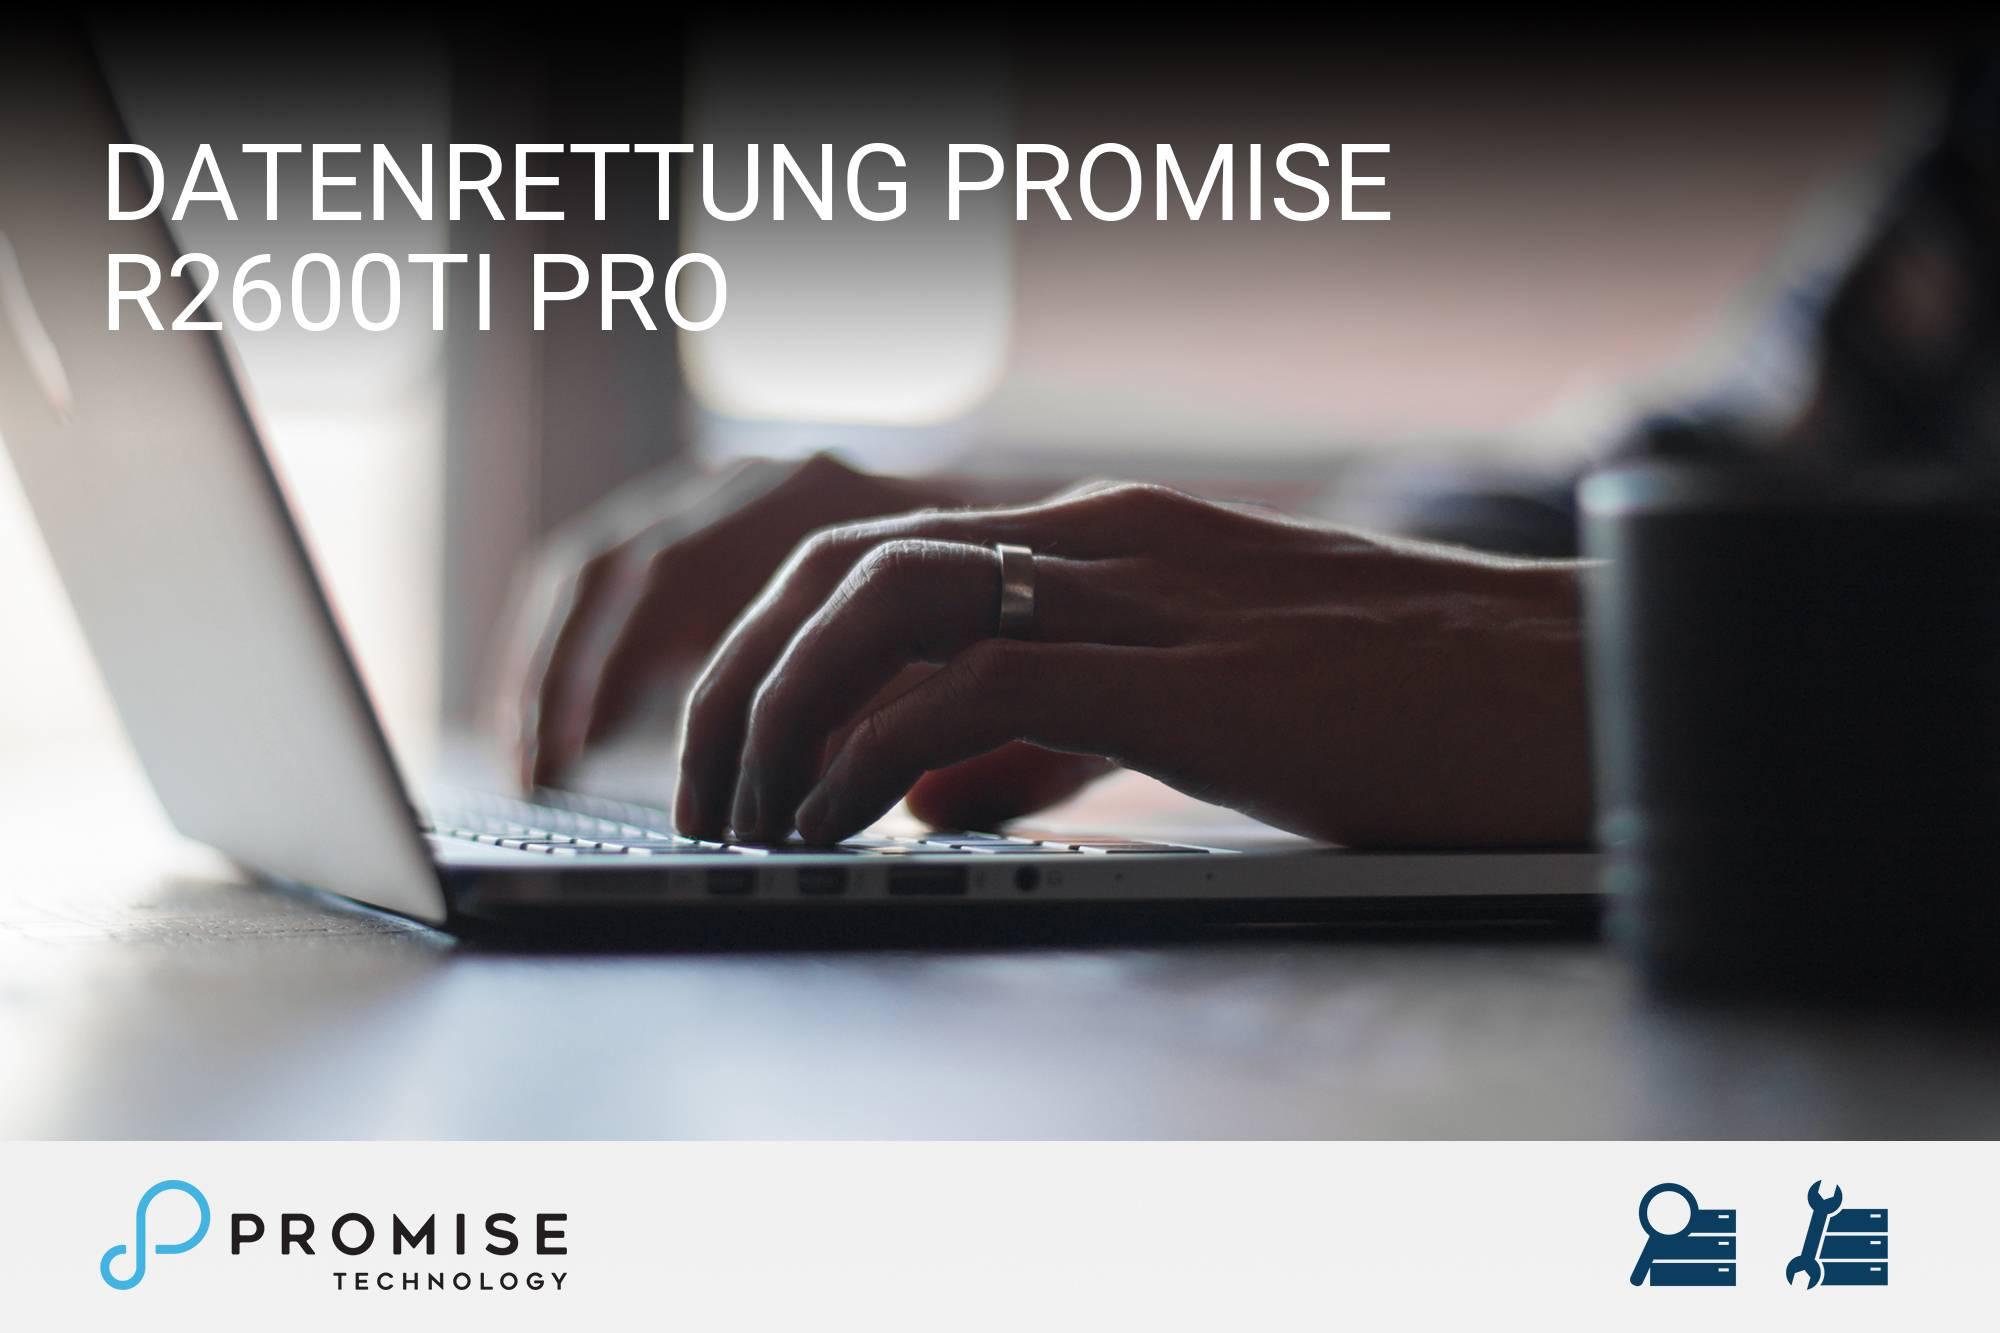 Promise R2600ti PRO